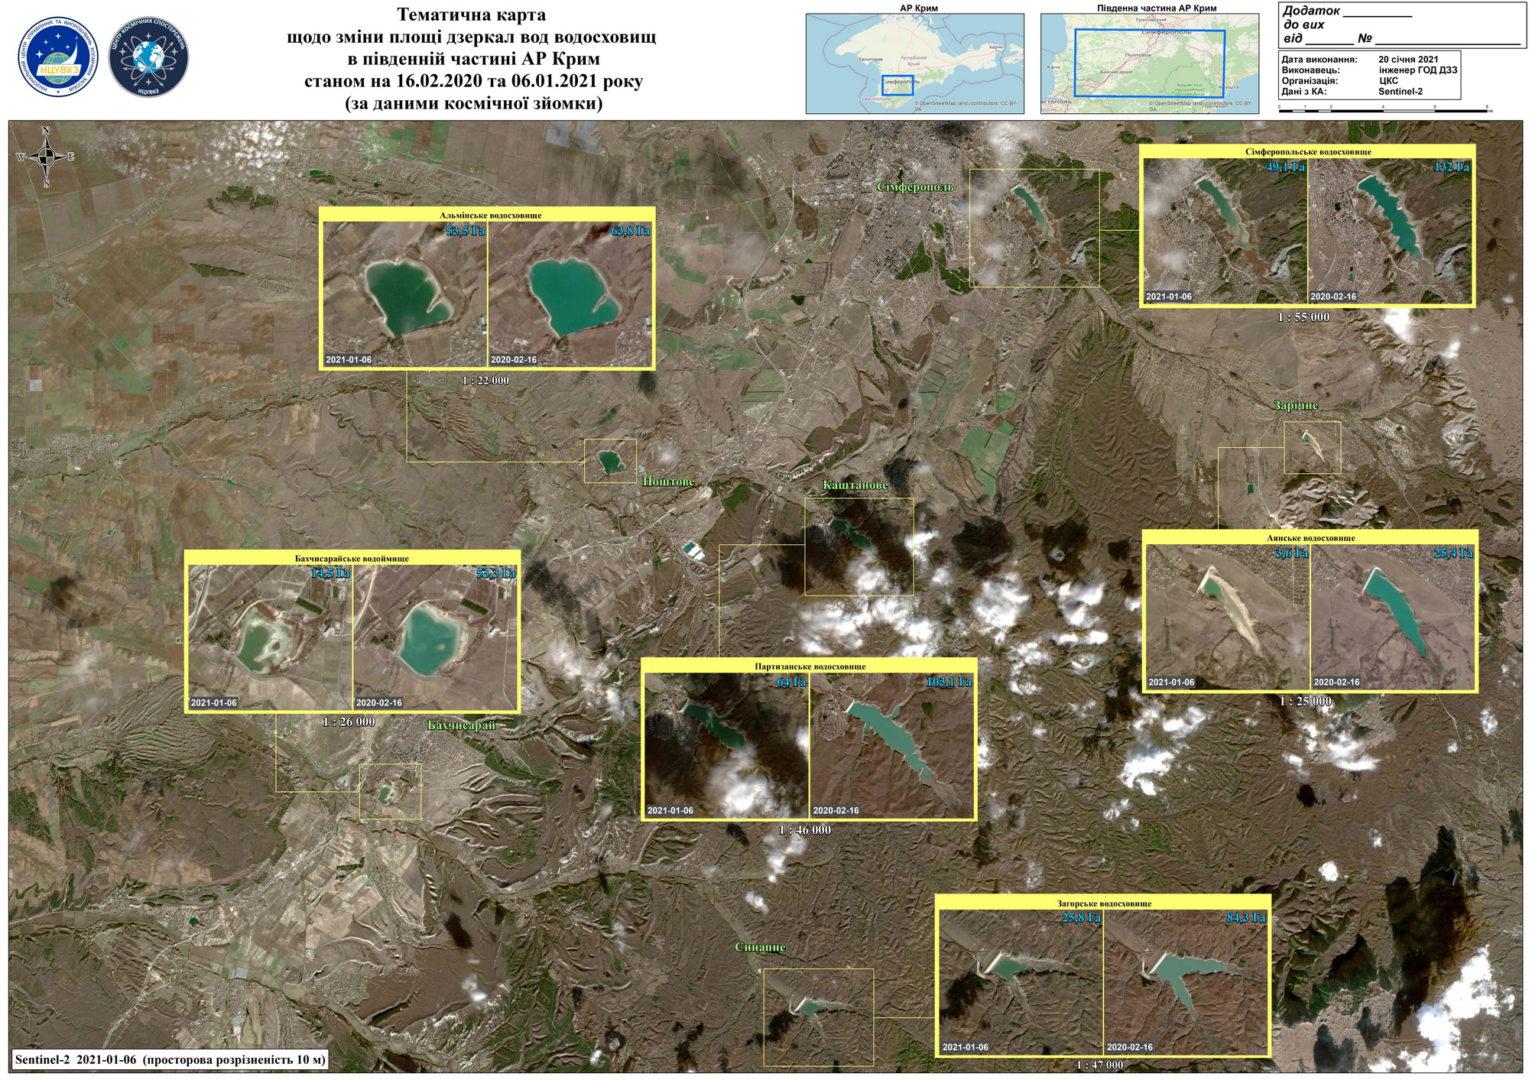 Рівень води у водосховищах Криму став нижче «мертвого об'єму» - Крим, водосховище, водойми, Вода - 24 voda2